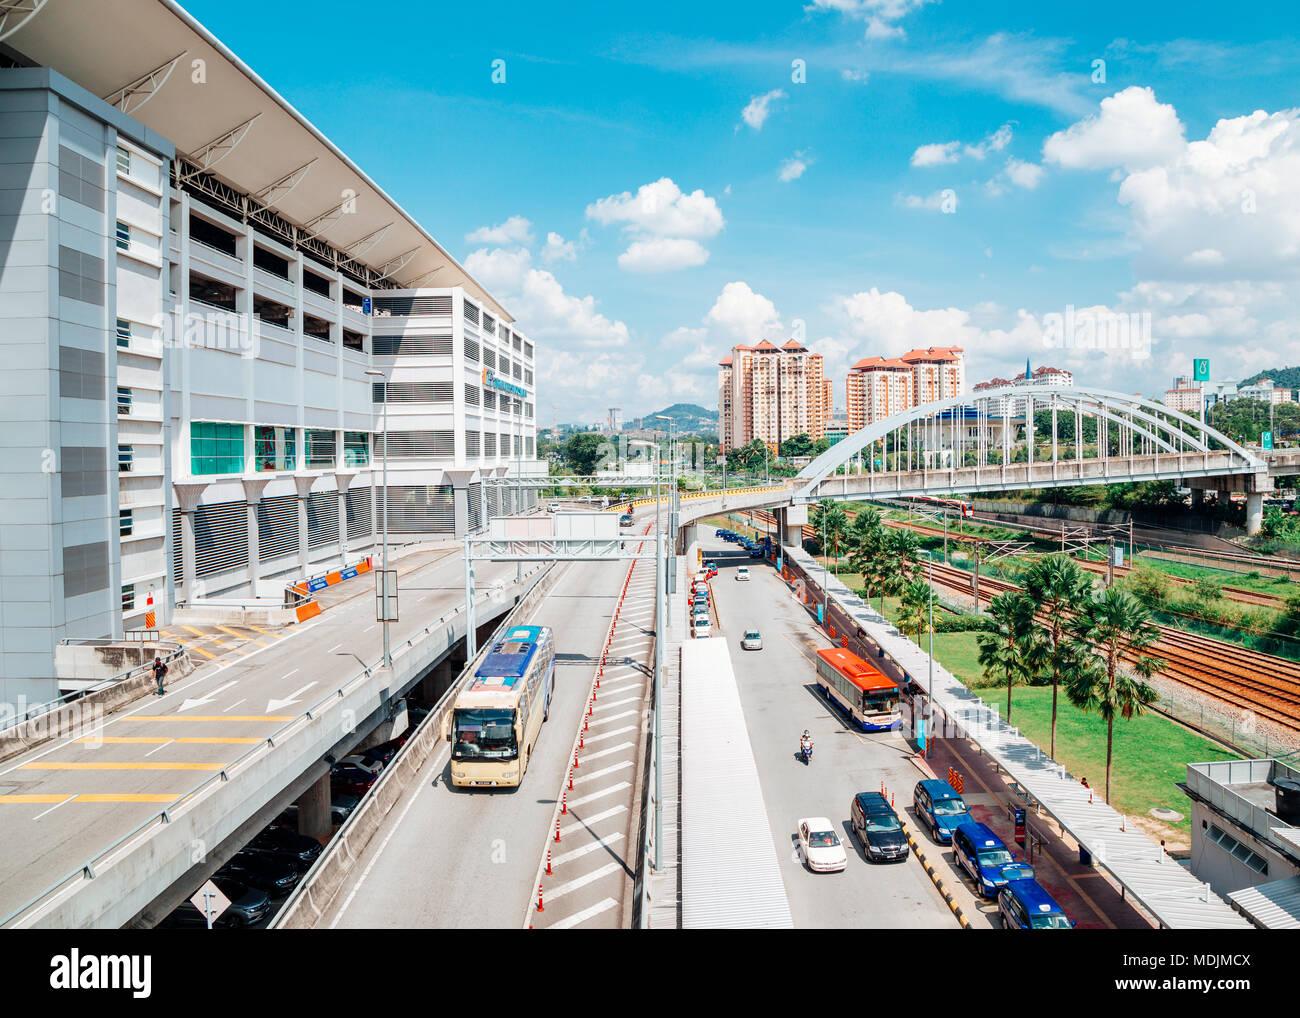 Kuala Lumpur, Malaysia - January 7, 2018 : Bus station TBS Terminal Bersepadu Selatan and Bandar Tasik Selatan Station - Stock Image